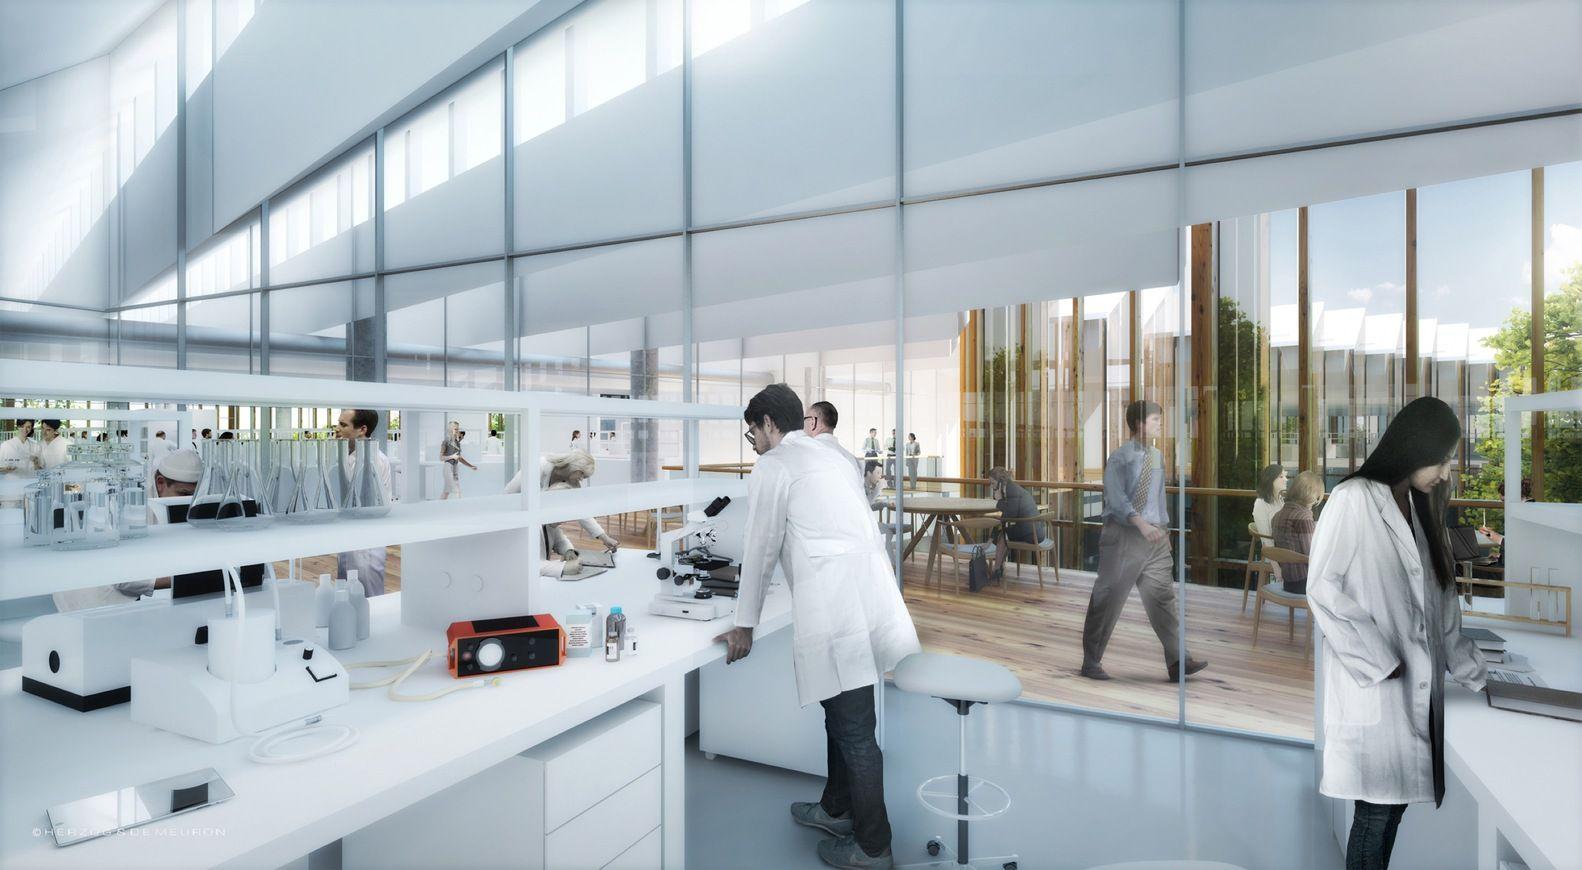 Gallery Of Herzog De Meuron S Astrazeneca R D Headquarters Tops Out In Cambridge 7 Laboratory Design Research Centre Design